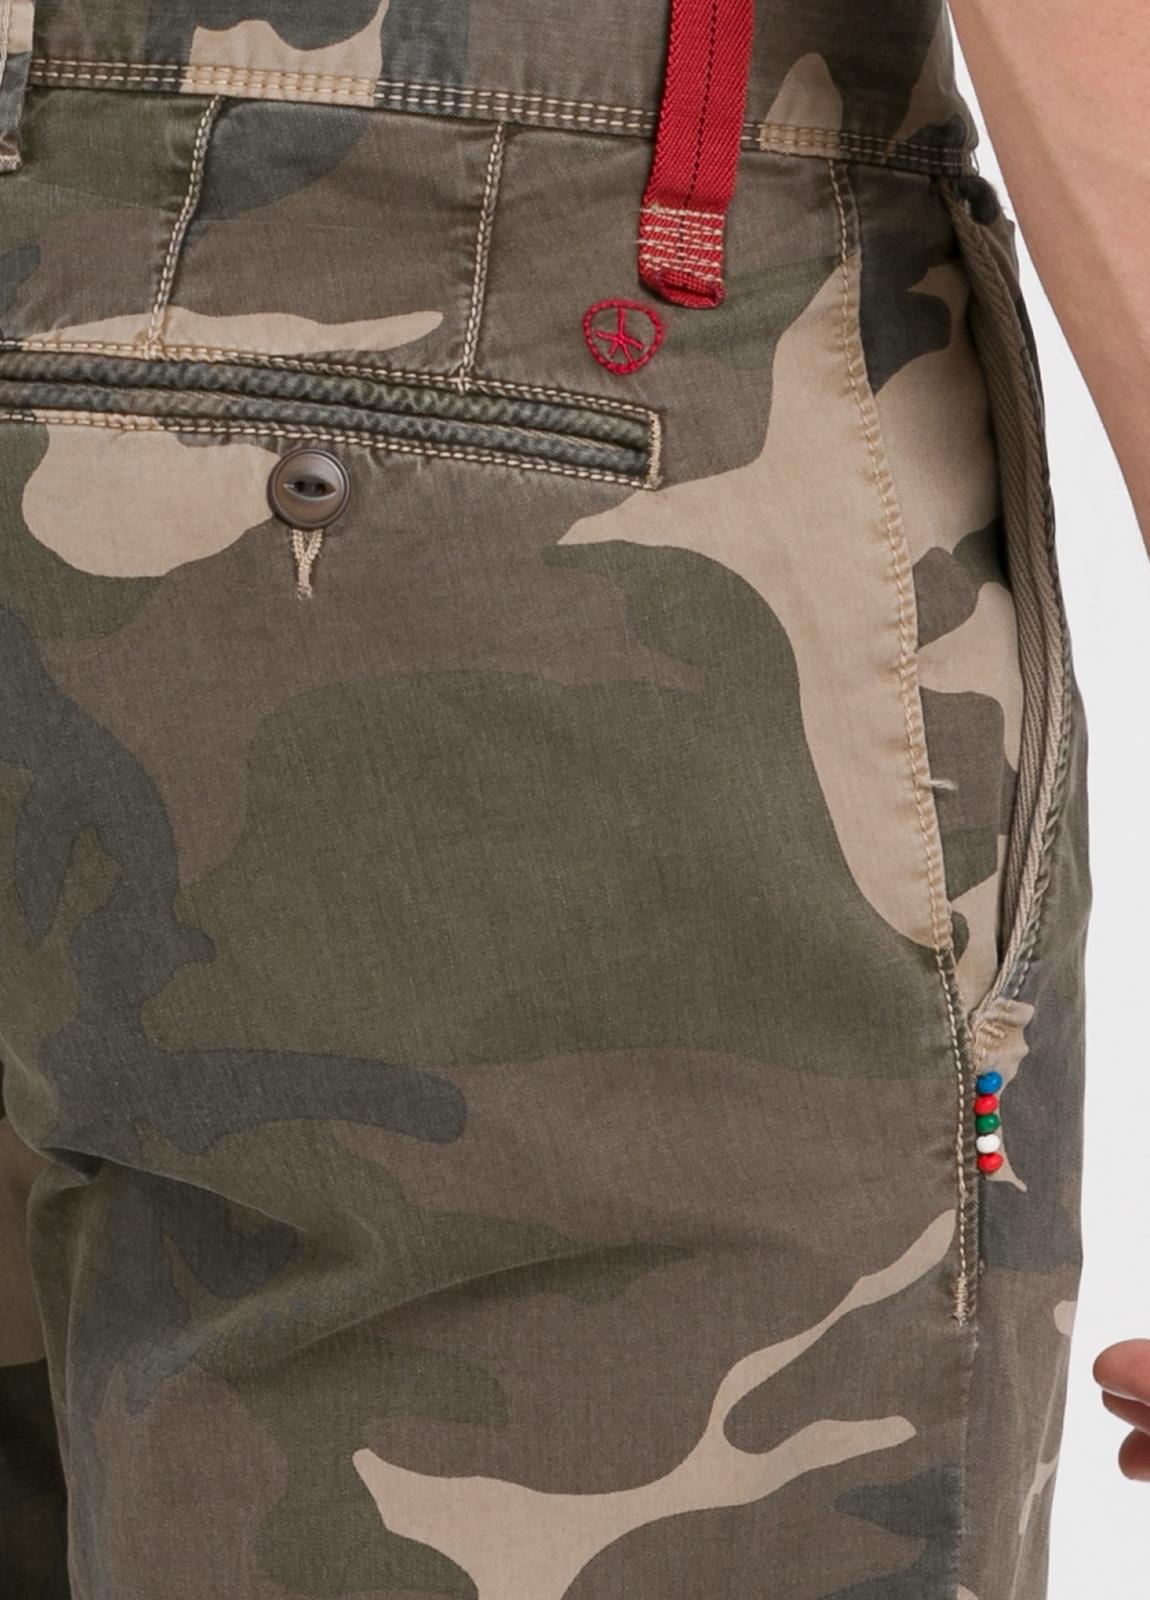 Pantalón sport modelo OSCAR con estampado de camuflaje. Algodón. - Ítem1